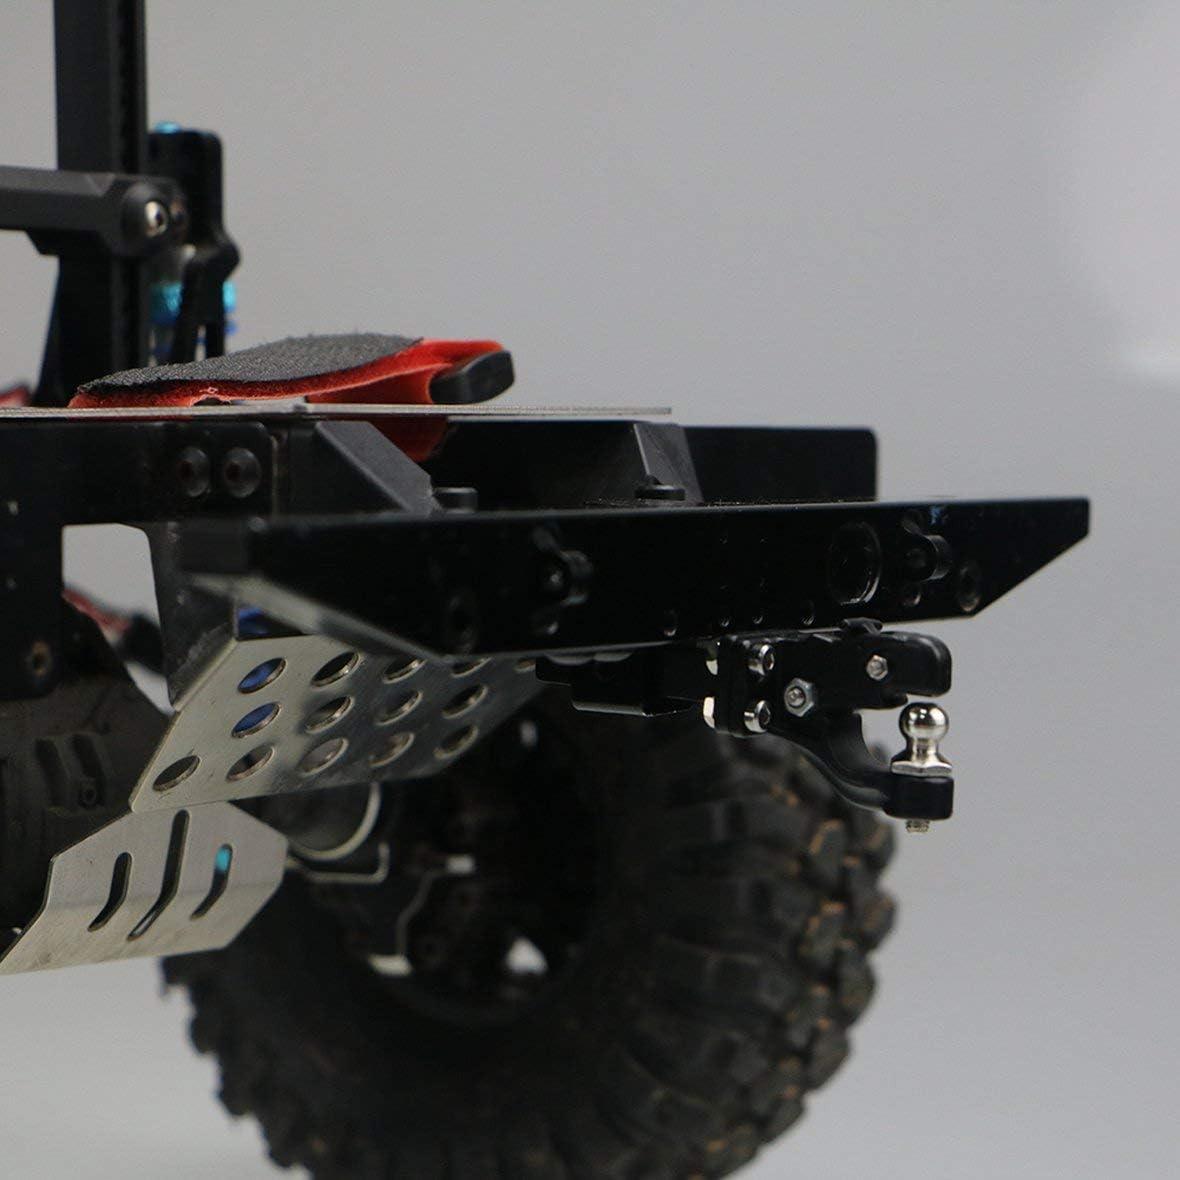 Tivolii SCX 10 Traxxas TRX4 Simulation Climbing Car Trailer Hook Flow Hook for 90046 90047 TRX4 Crawler Toys for Children RC Car Parts